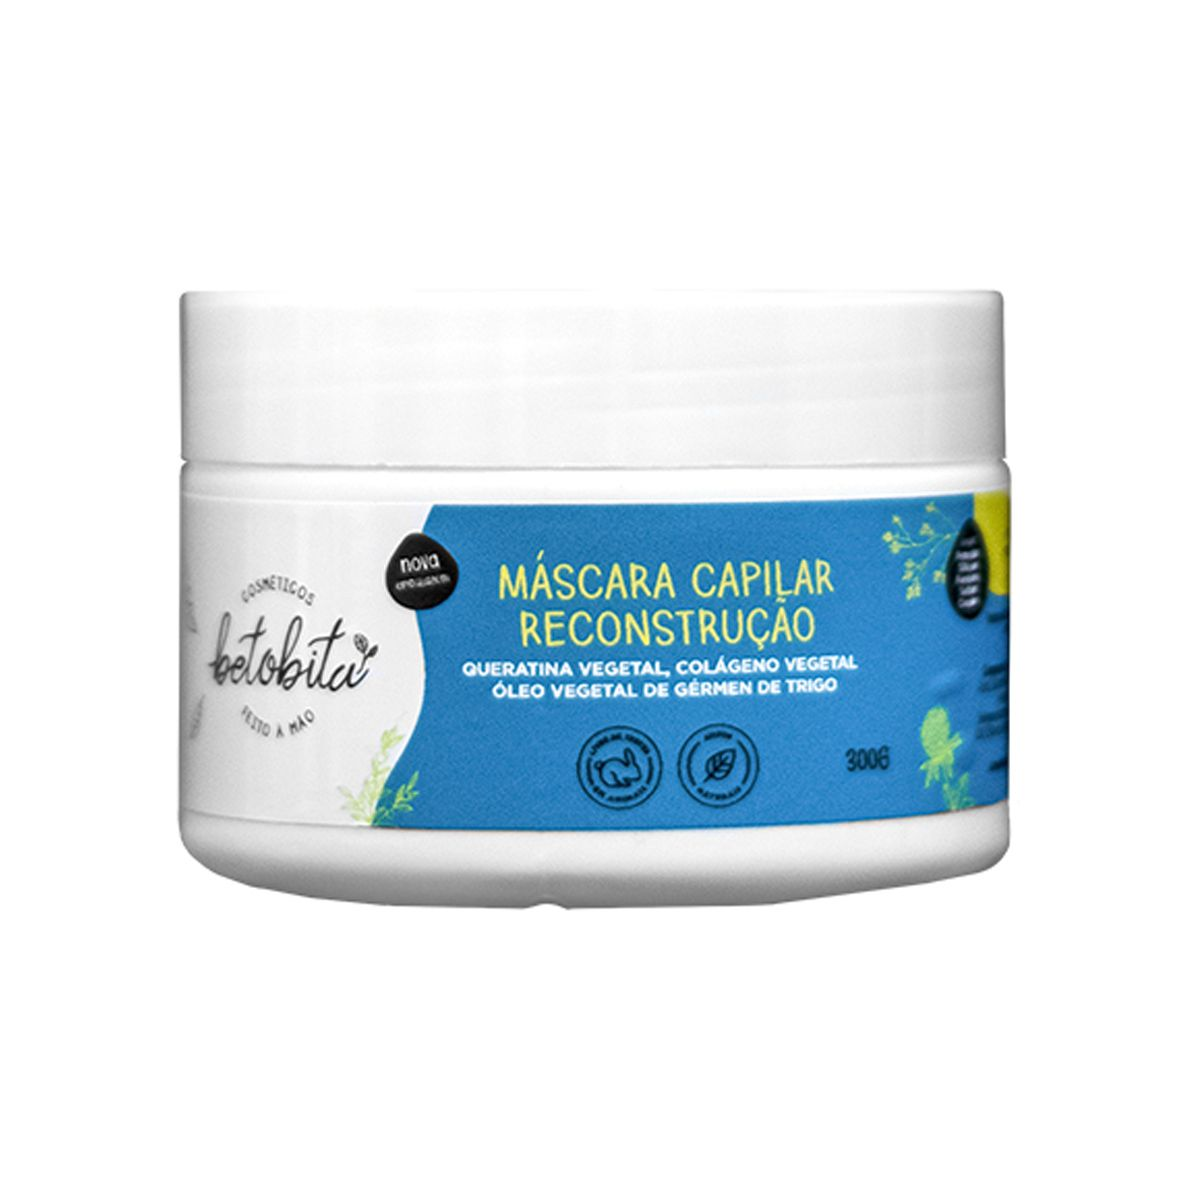 Máscara Capilar Reconstrução - BetoBita - 300g